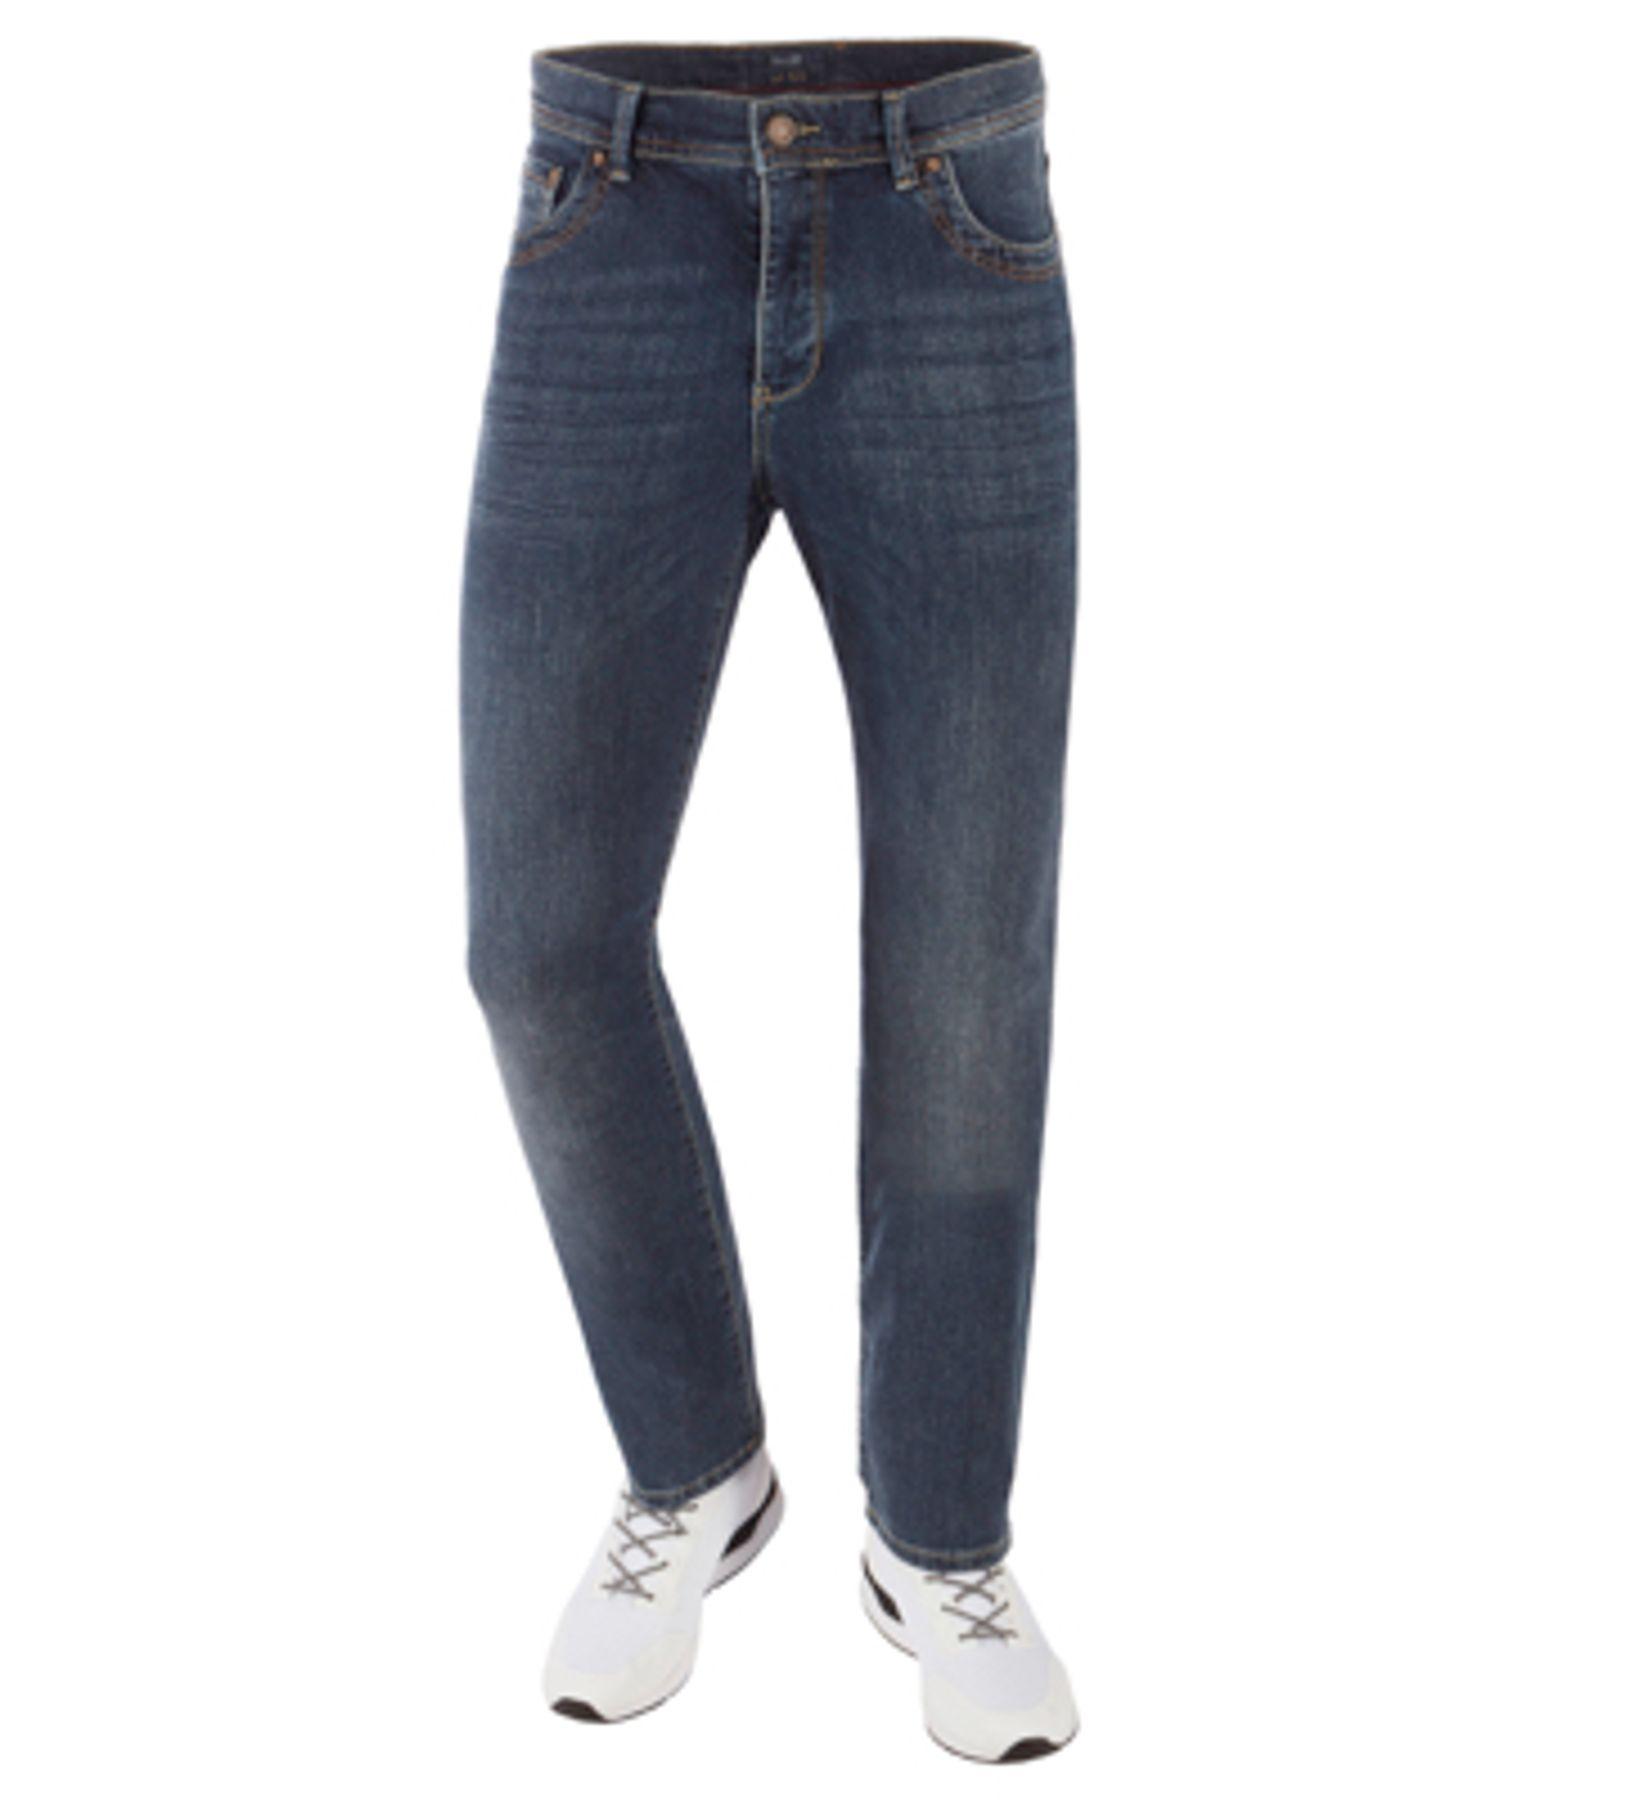 Bugatti - Herren Jeans Five Pocket-Hose Used Look Raw oder Black (Art. Nr.: 3470D-26602) – Bild 3